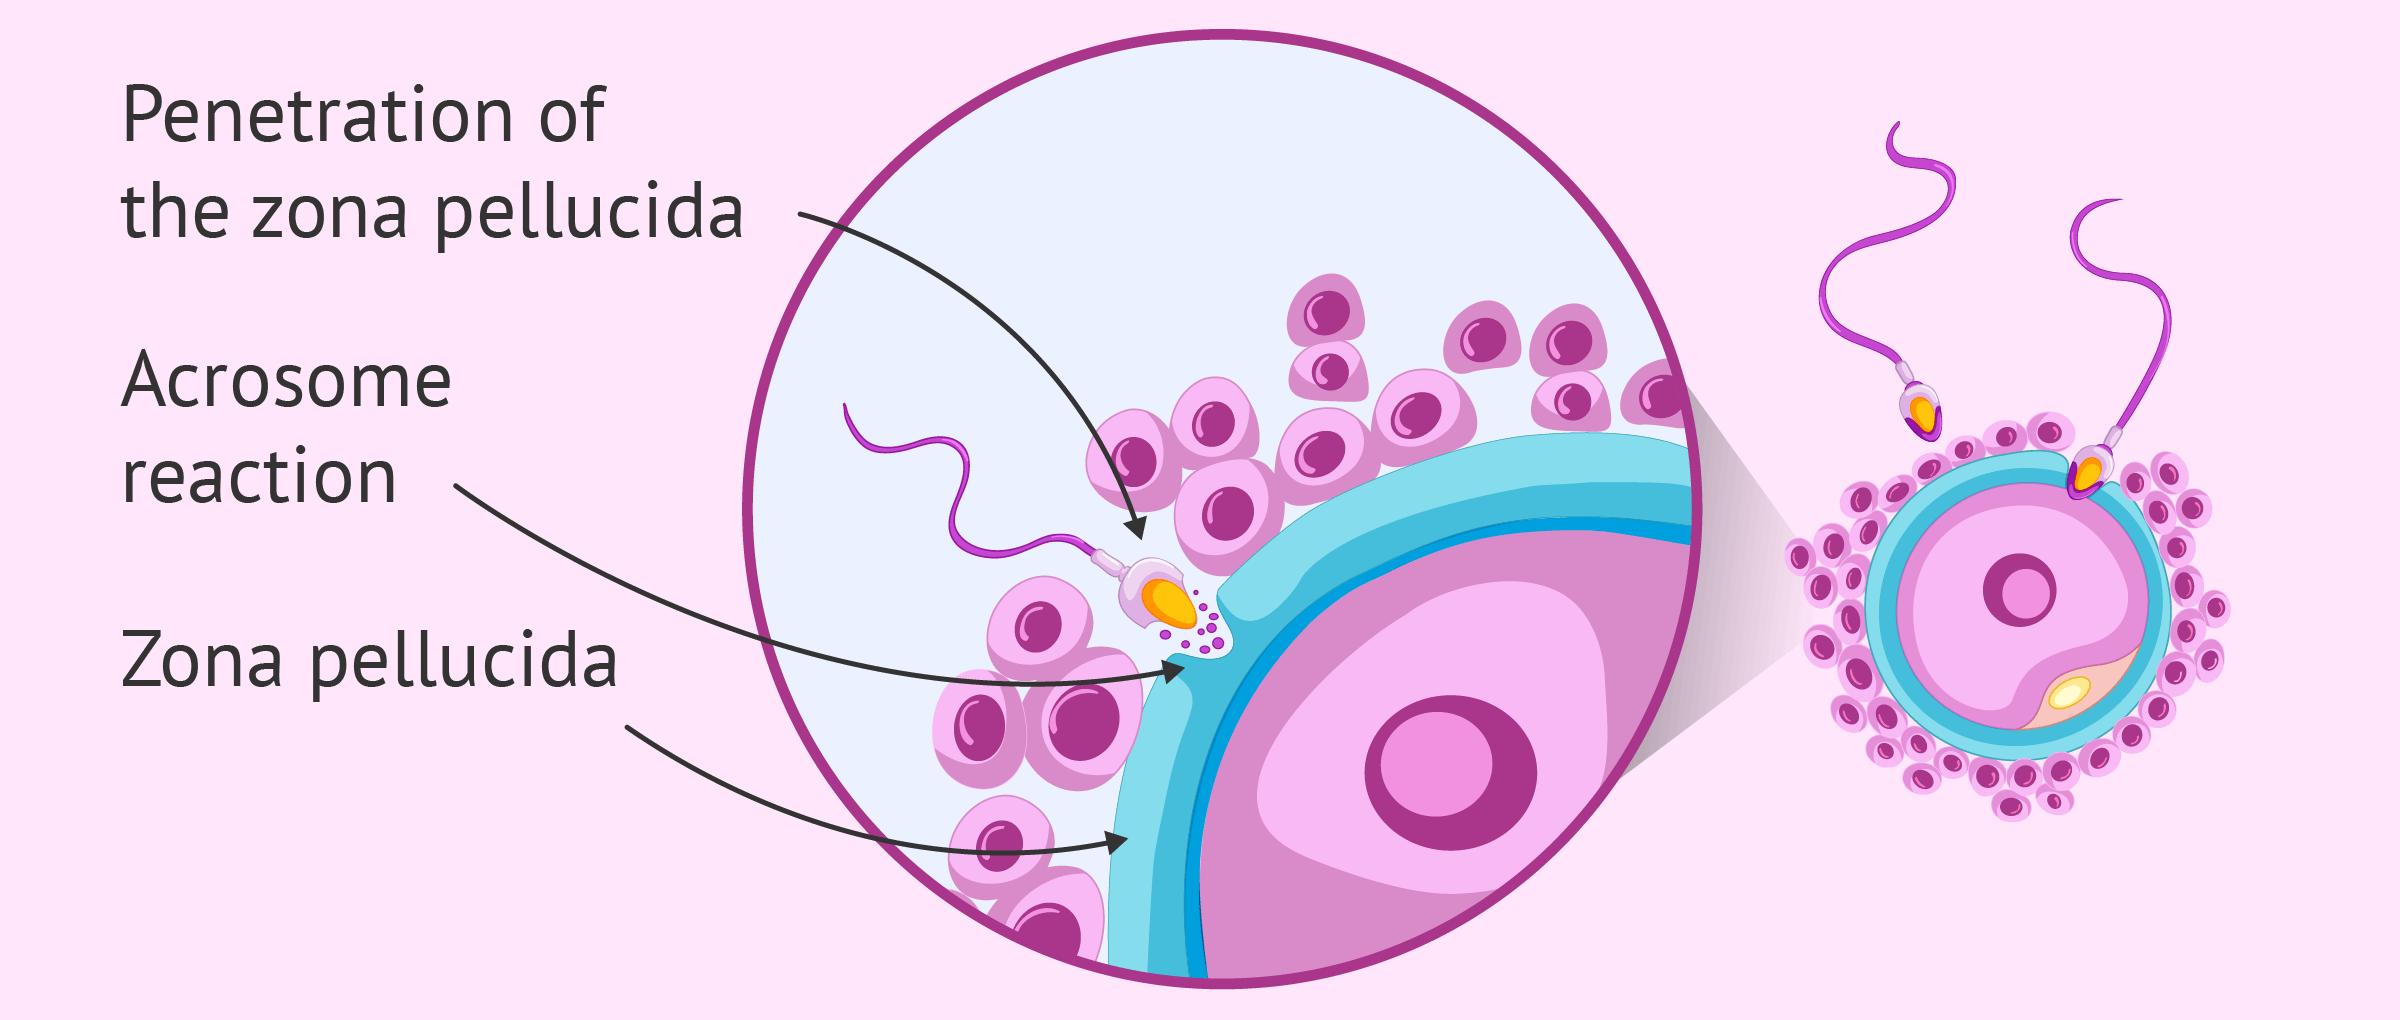 Penetration of the zona pellucida